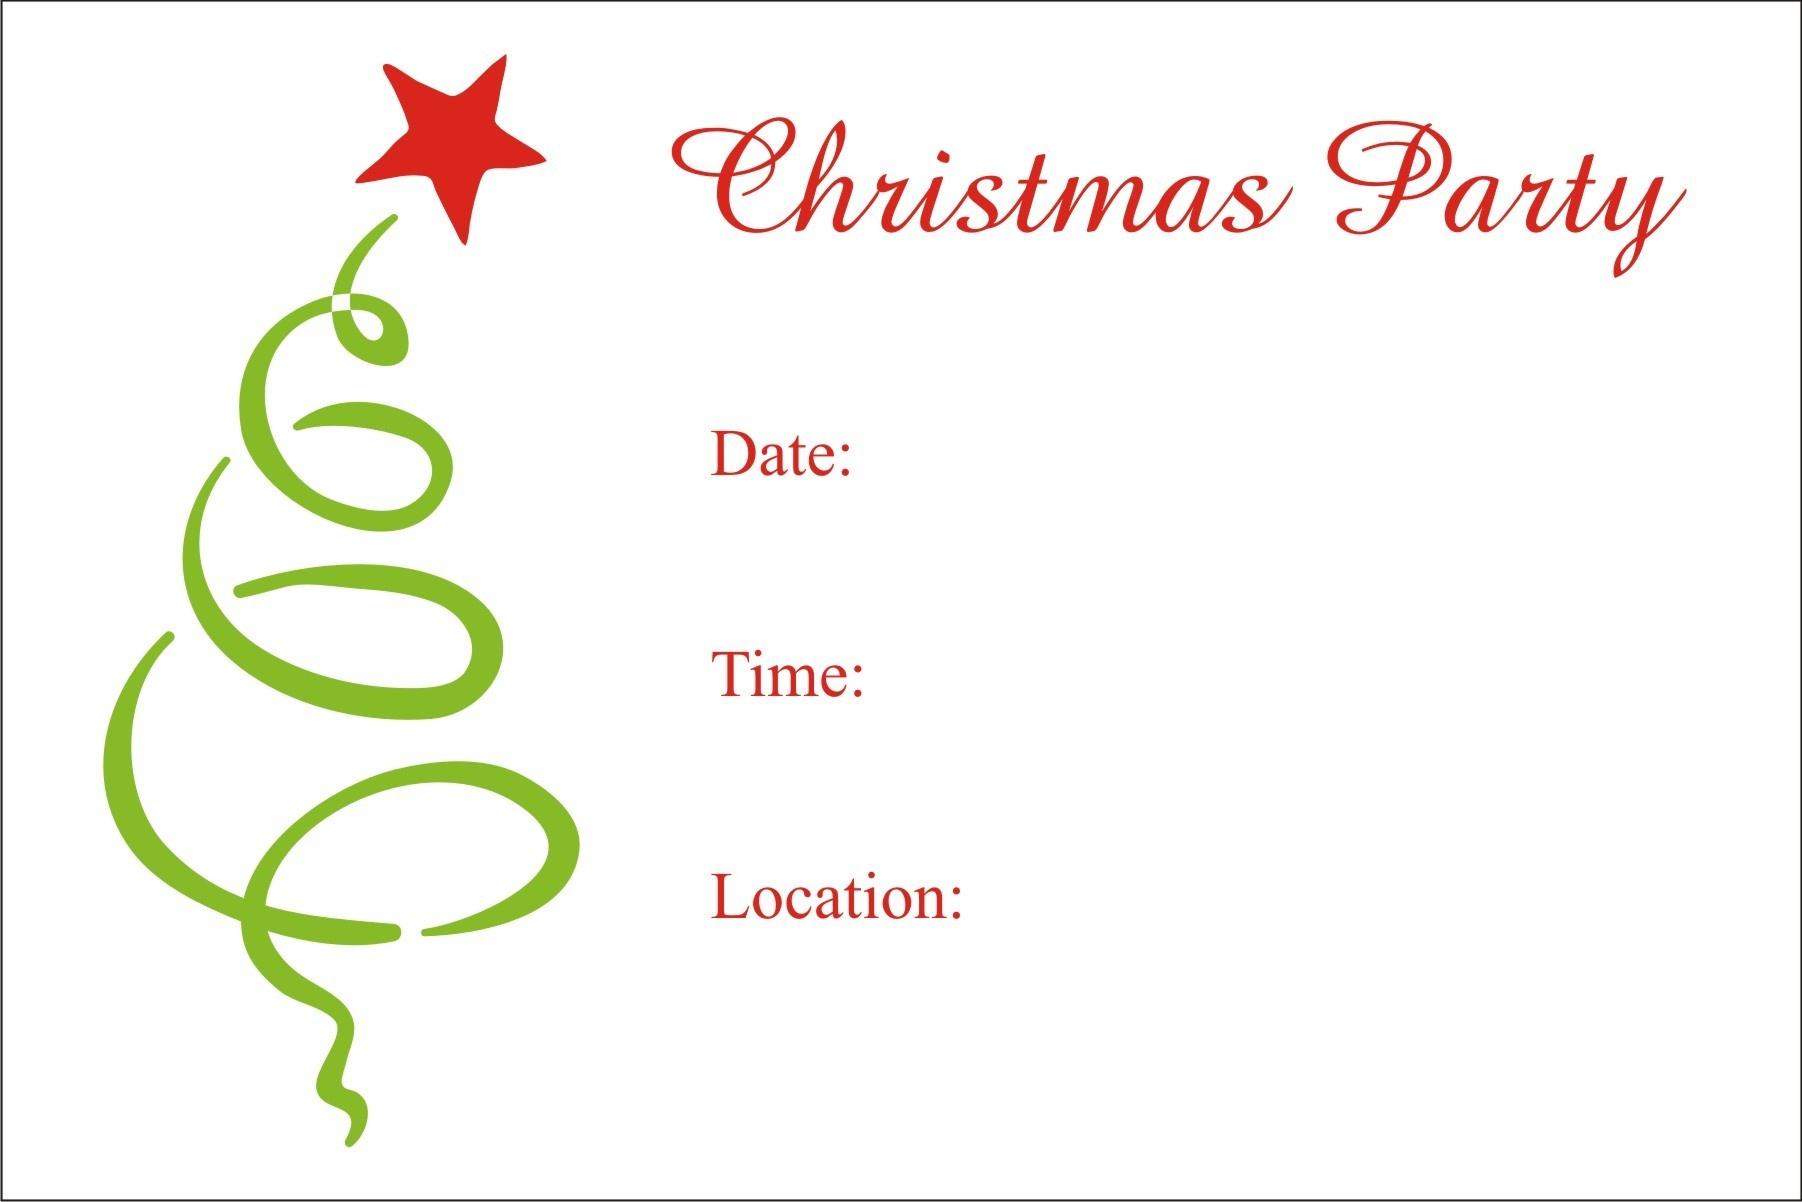 Christmas Party Free Printable Holiday Invitation Personalized Party - Free Printable Christmas Invitations